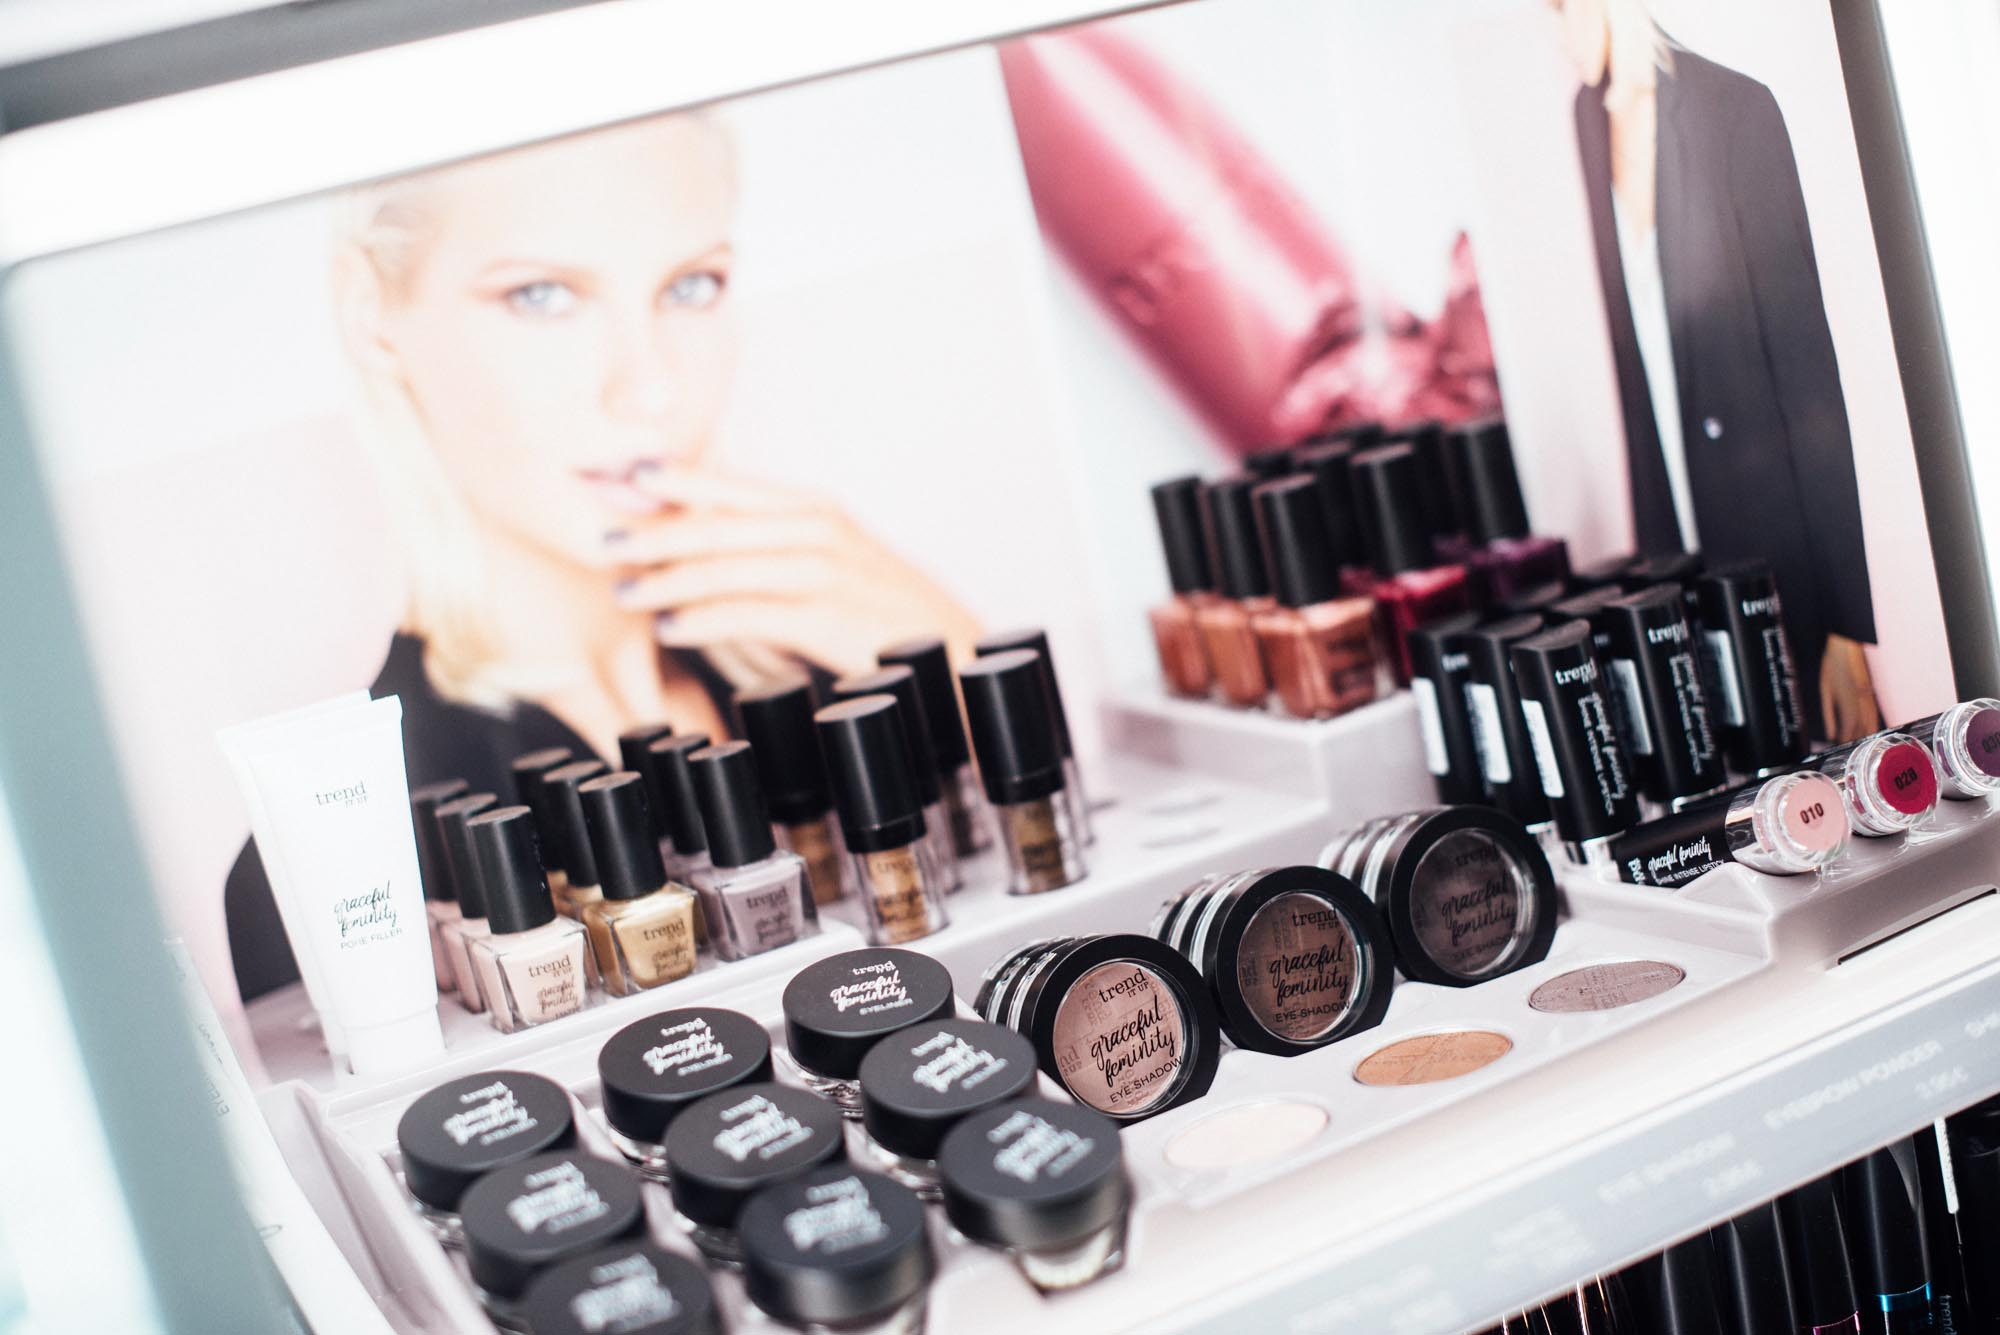 16-Kiamisu-Modeblog-Fashionblog_Kassel_dm trend it up_event_neue theke_neuheiten_ab märz_neuprodukte-8_final